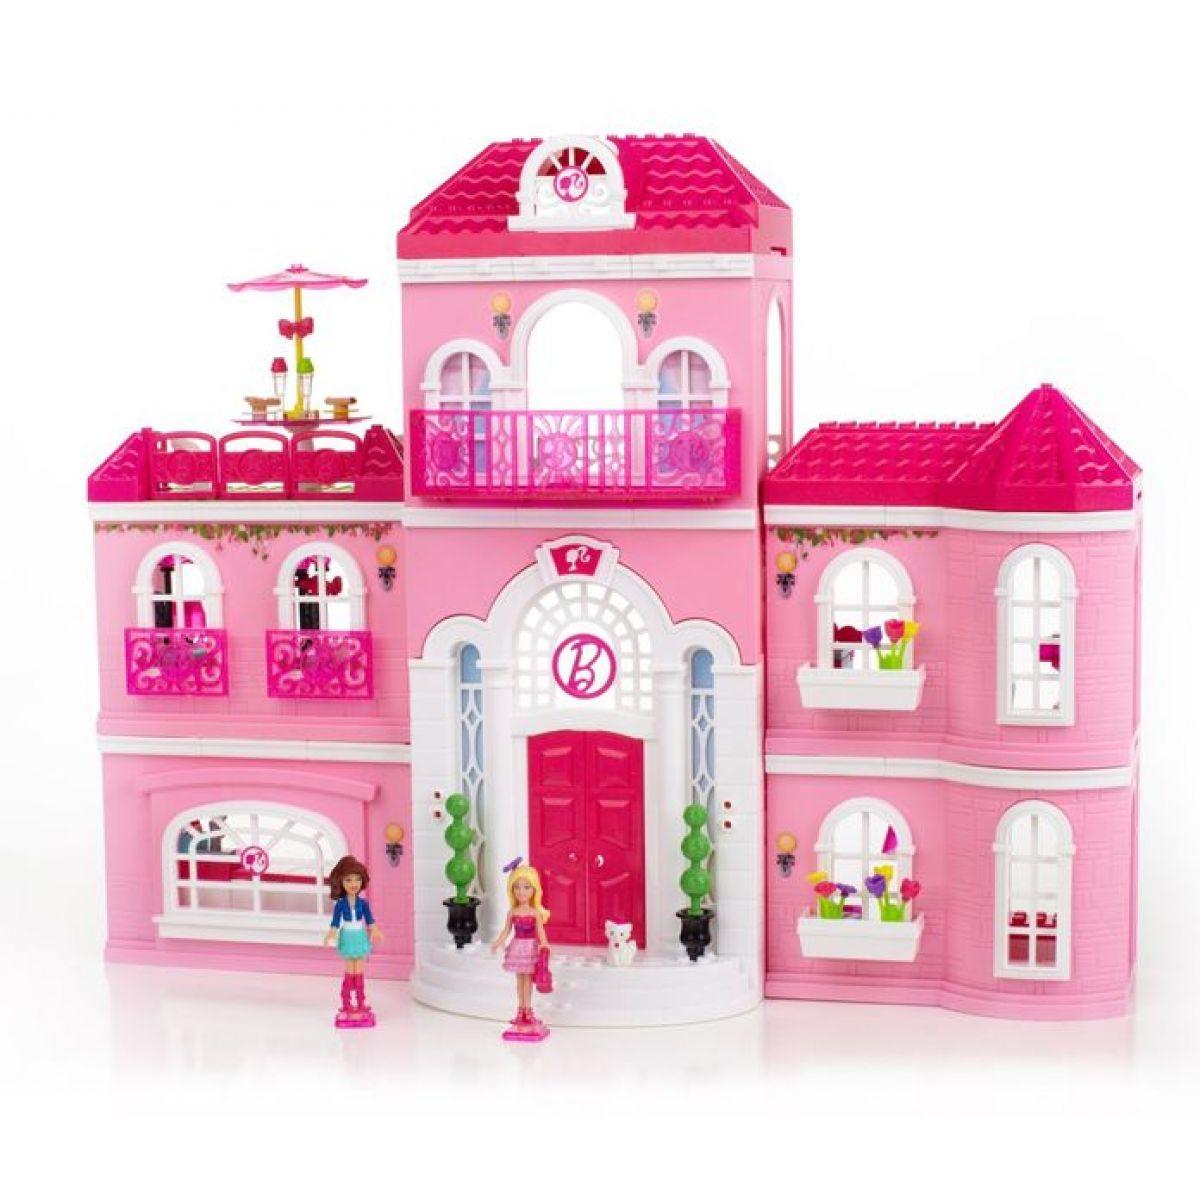 Megabloks Barbie v luxusním domě 301 kostek